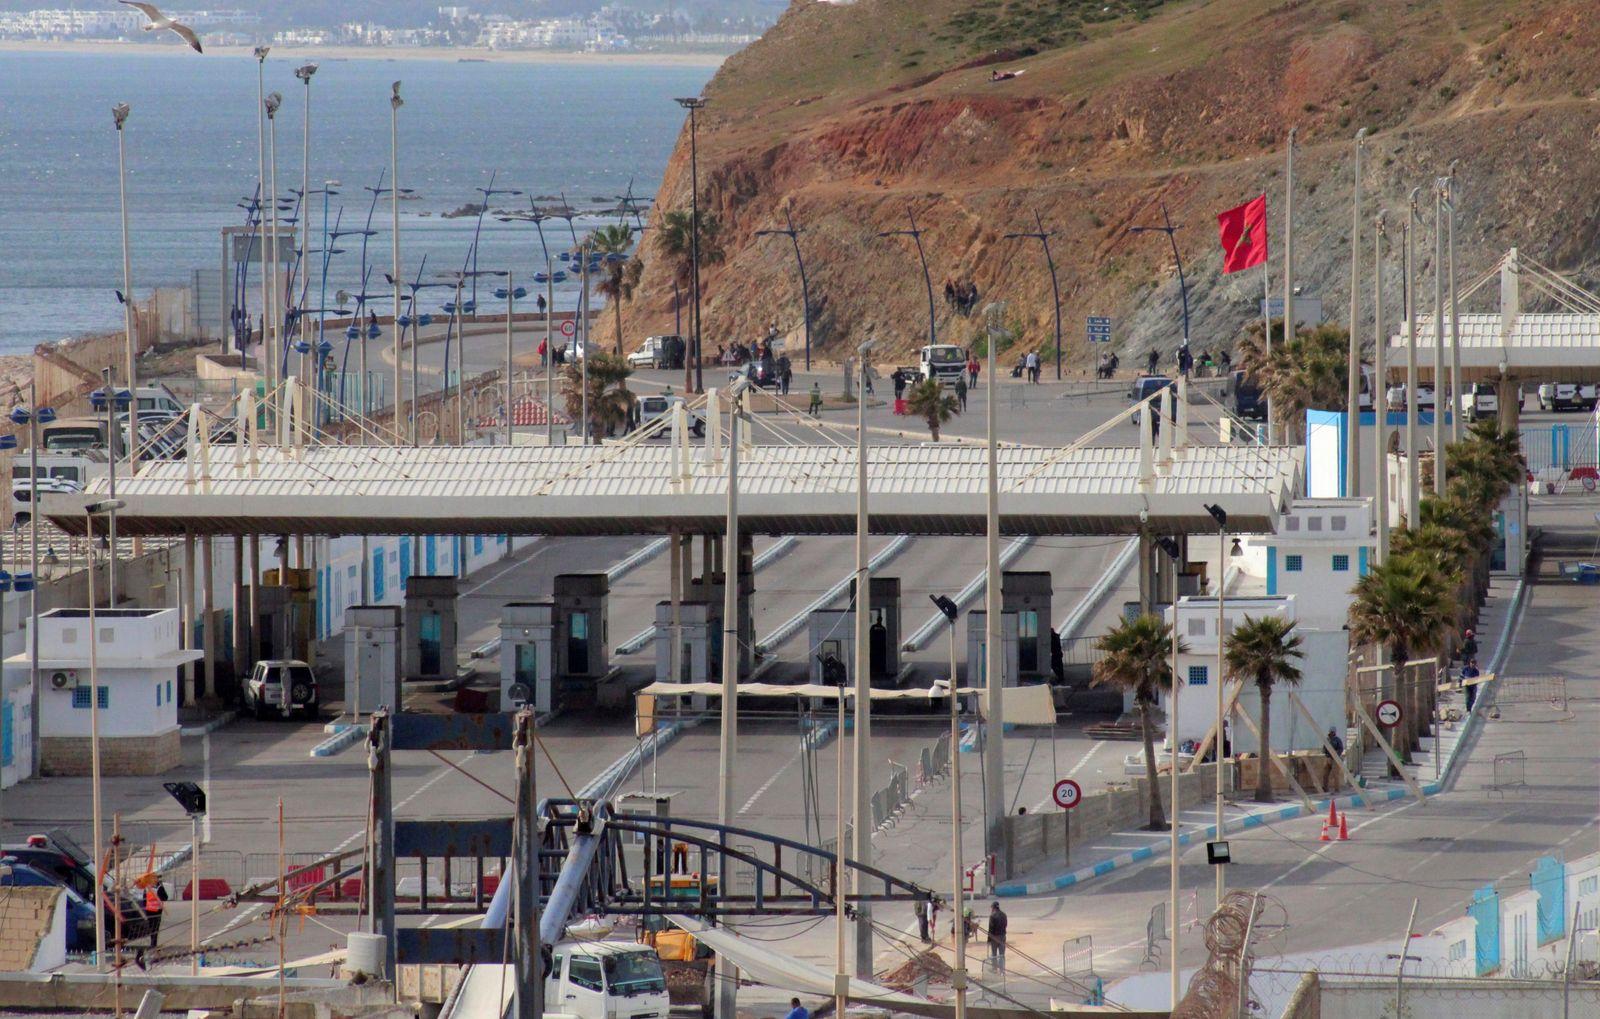 Morocco closes border with Spain amid coronavirus pandemic, Ceuta - 13 Mar 2020